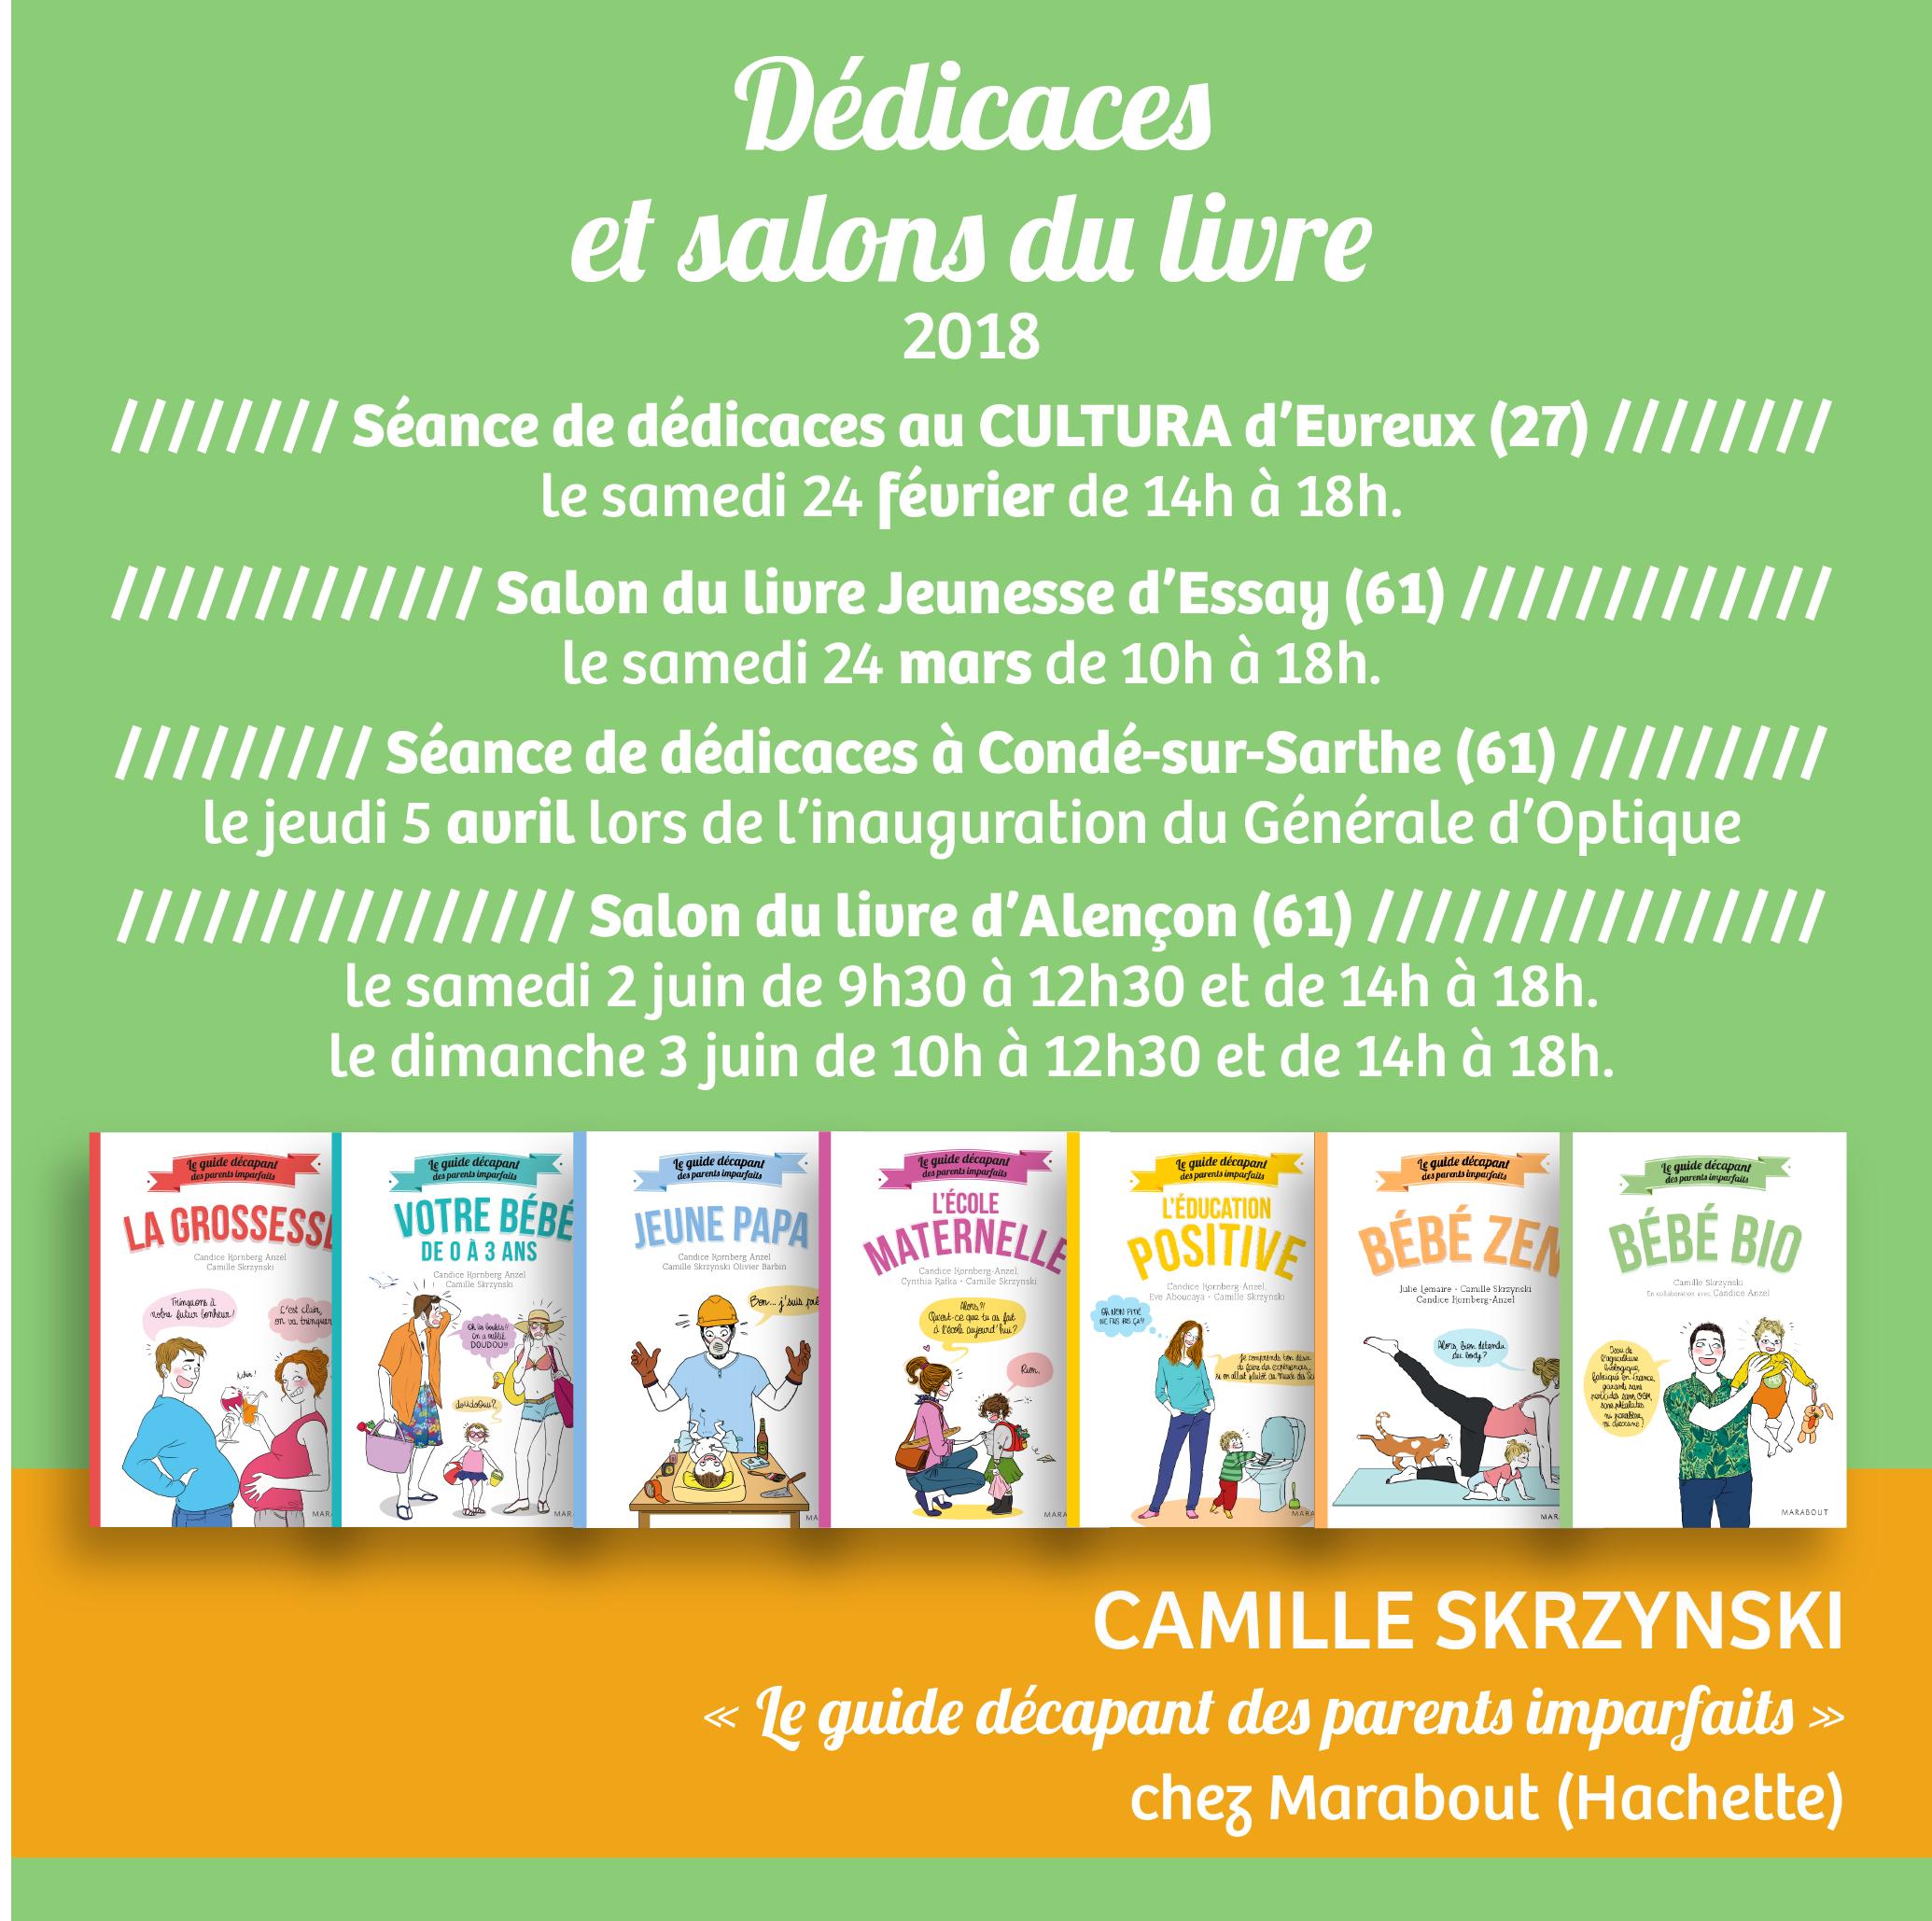 Dedicaces 2018 Camille Skrzynski